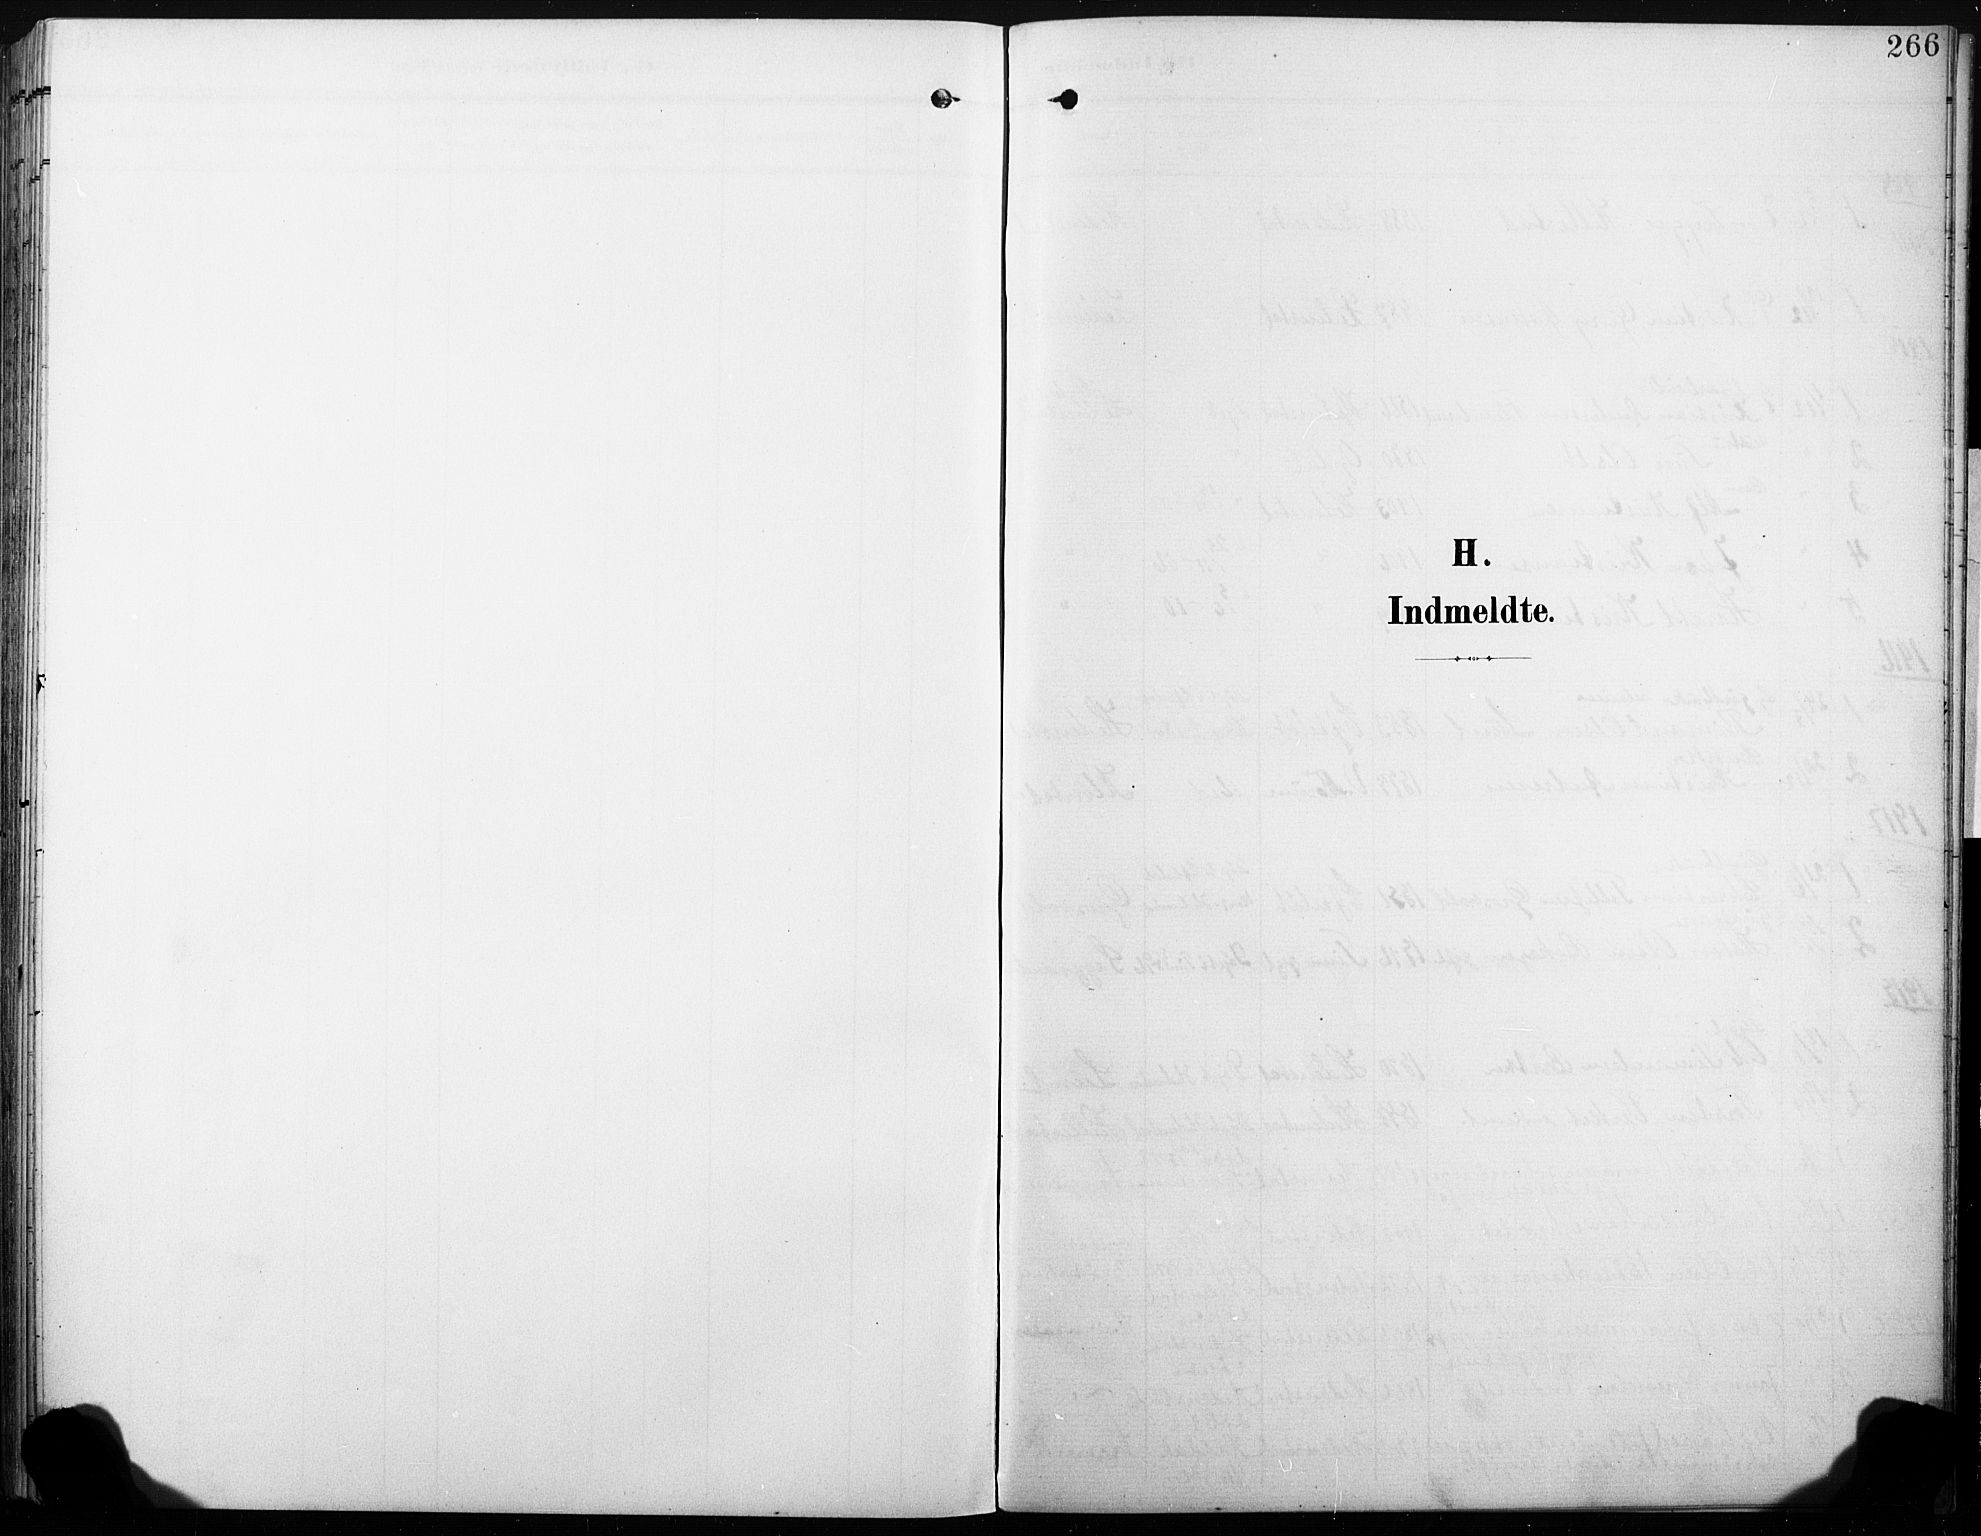 SAKO, Sandsvær kirkebøker, G/Gd/L0004a: Parish register (copy) no. IV 4A, 1901-1932, p. 266